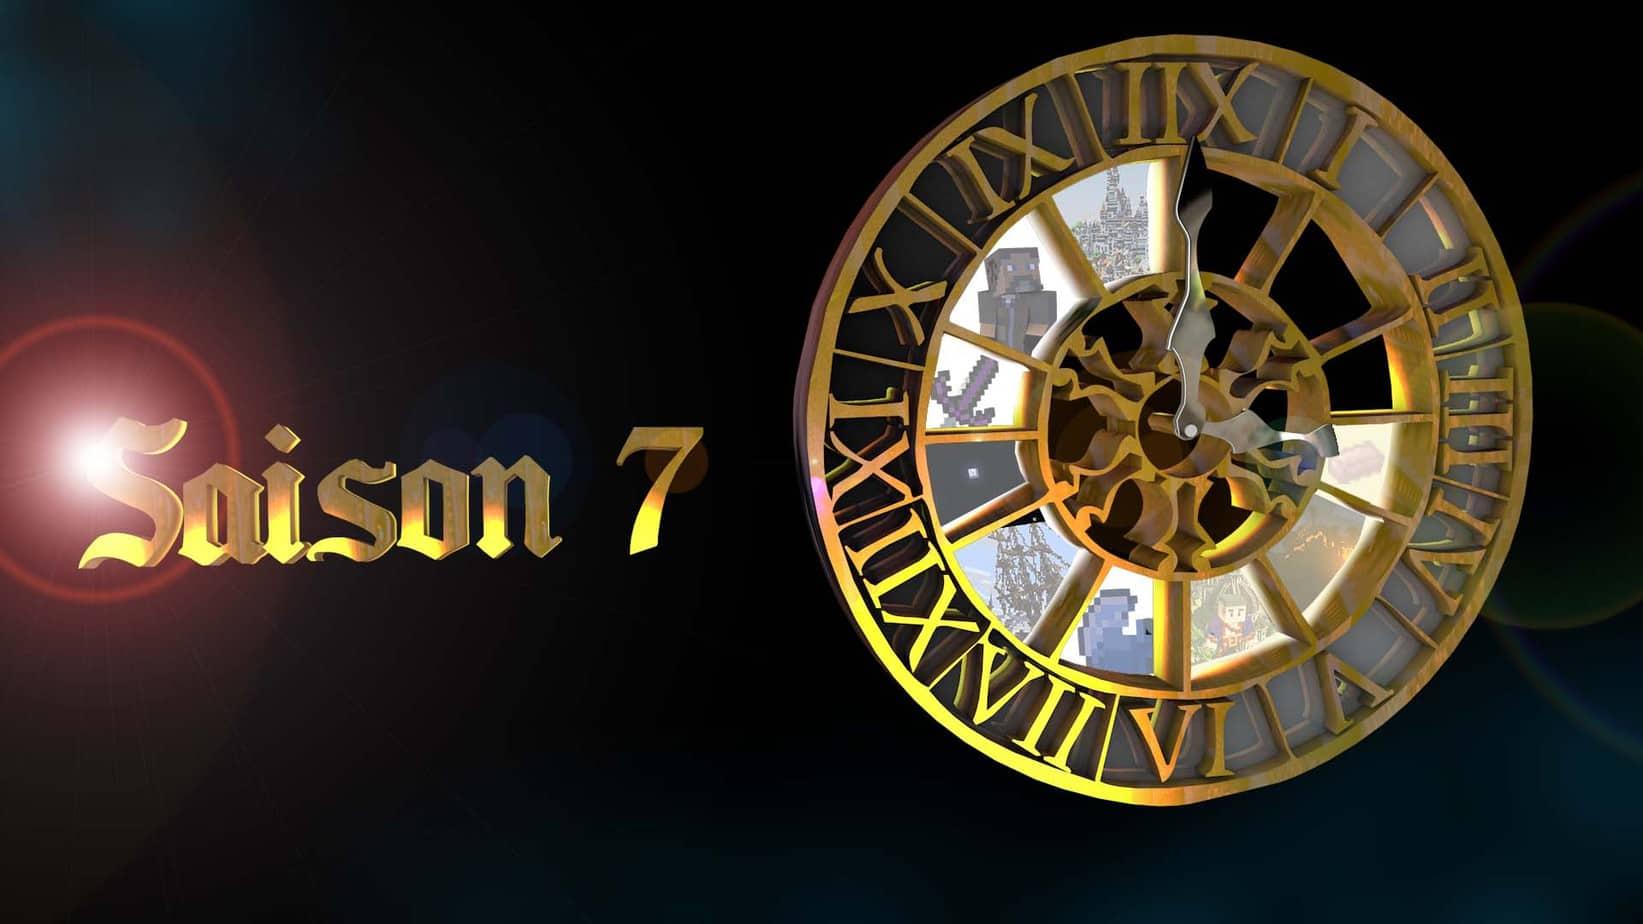 saison7_teaser3.jpg